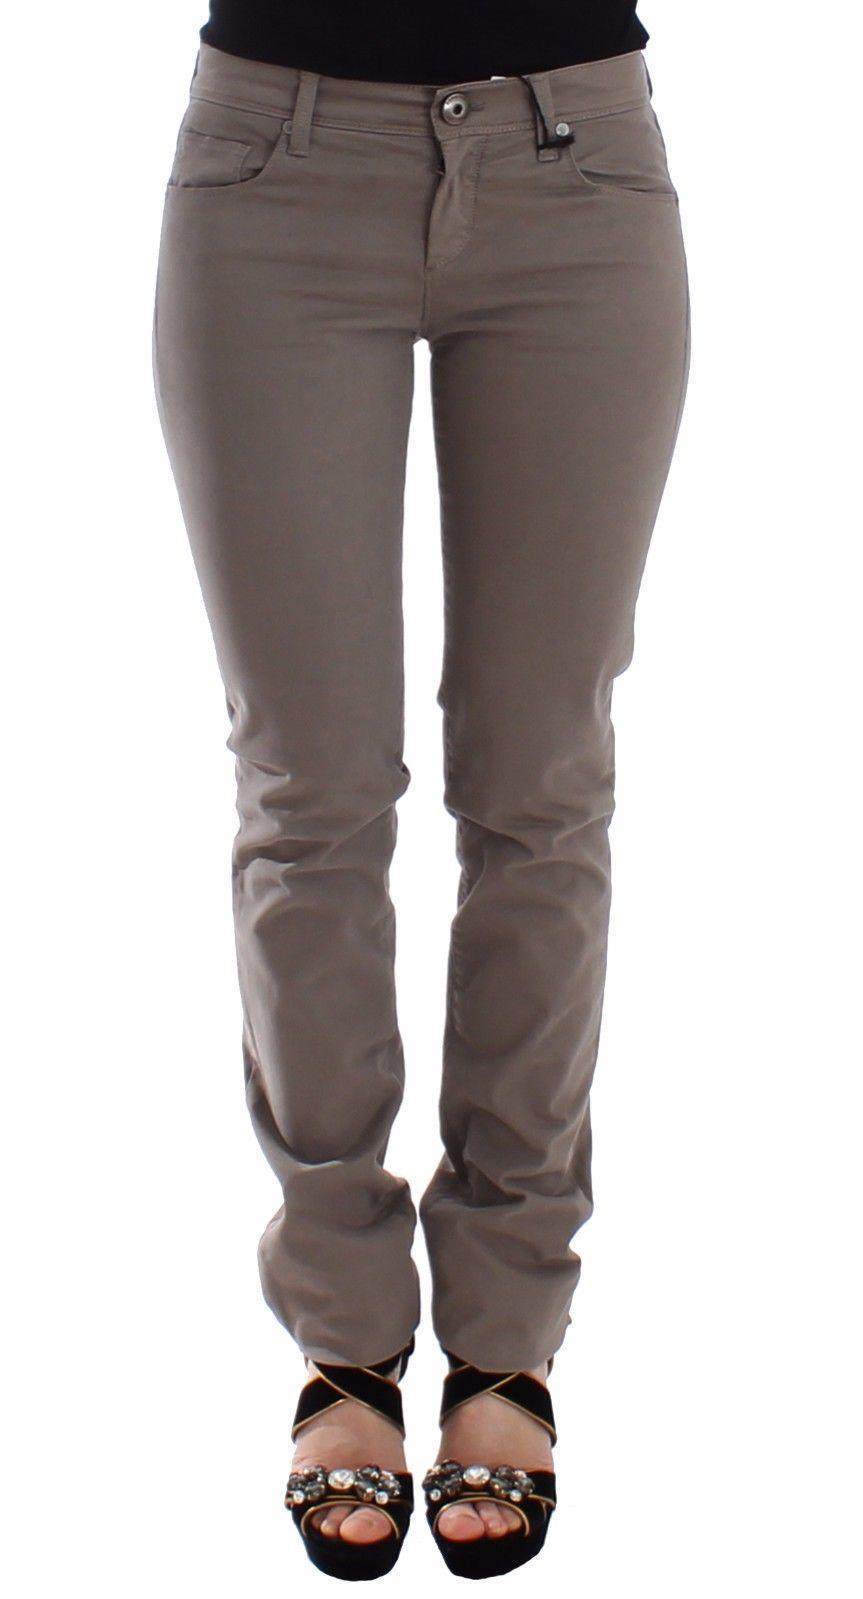 Ermanno Scervino Women's Slim Jeans Beige SIG12685 - IT40